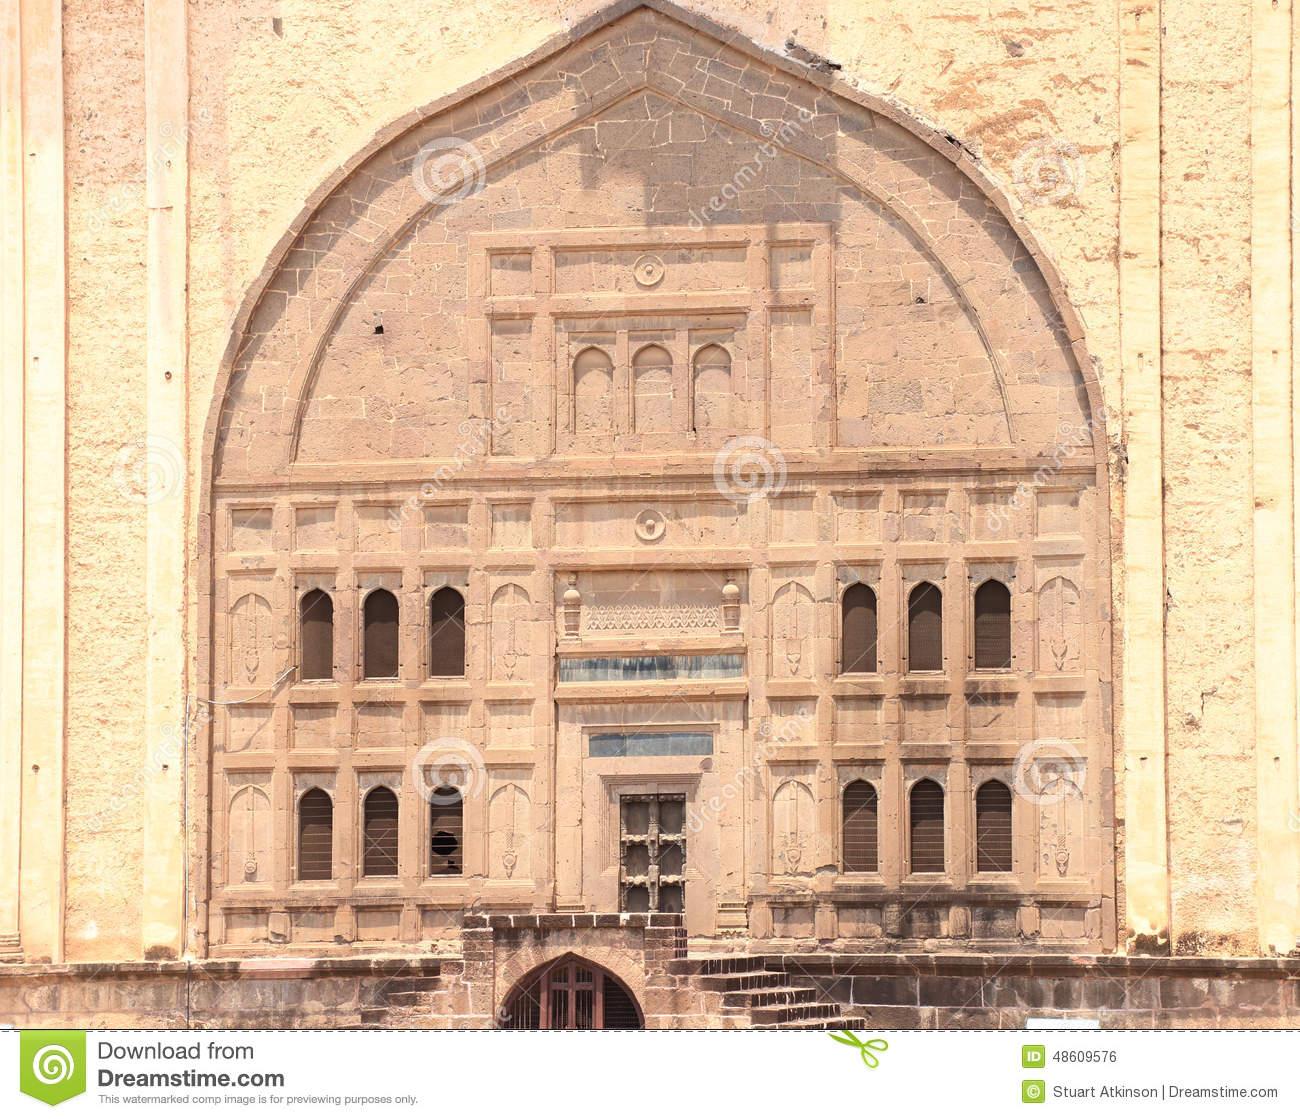 Gol Gumbaz Palace Entrance And Mausoleum Bijapur Karnataka Indi.